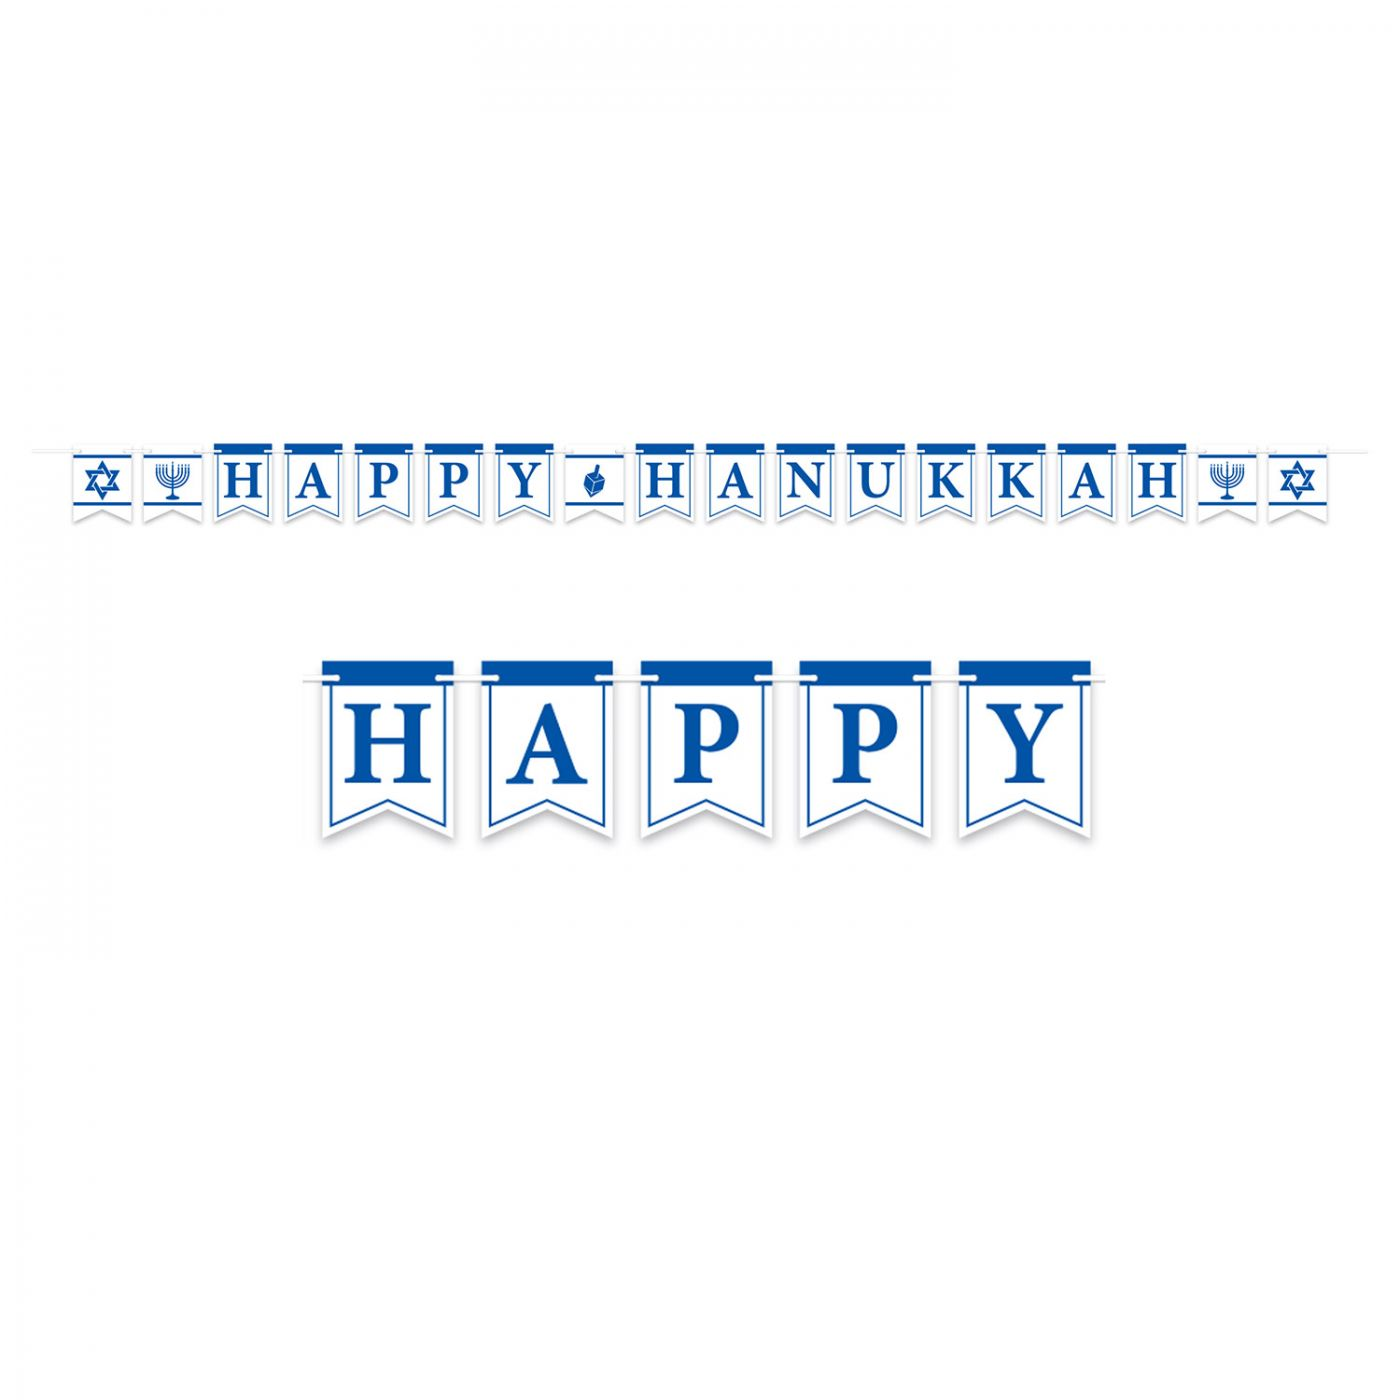 Happy Hanukkah Streamer image